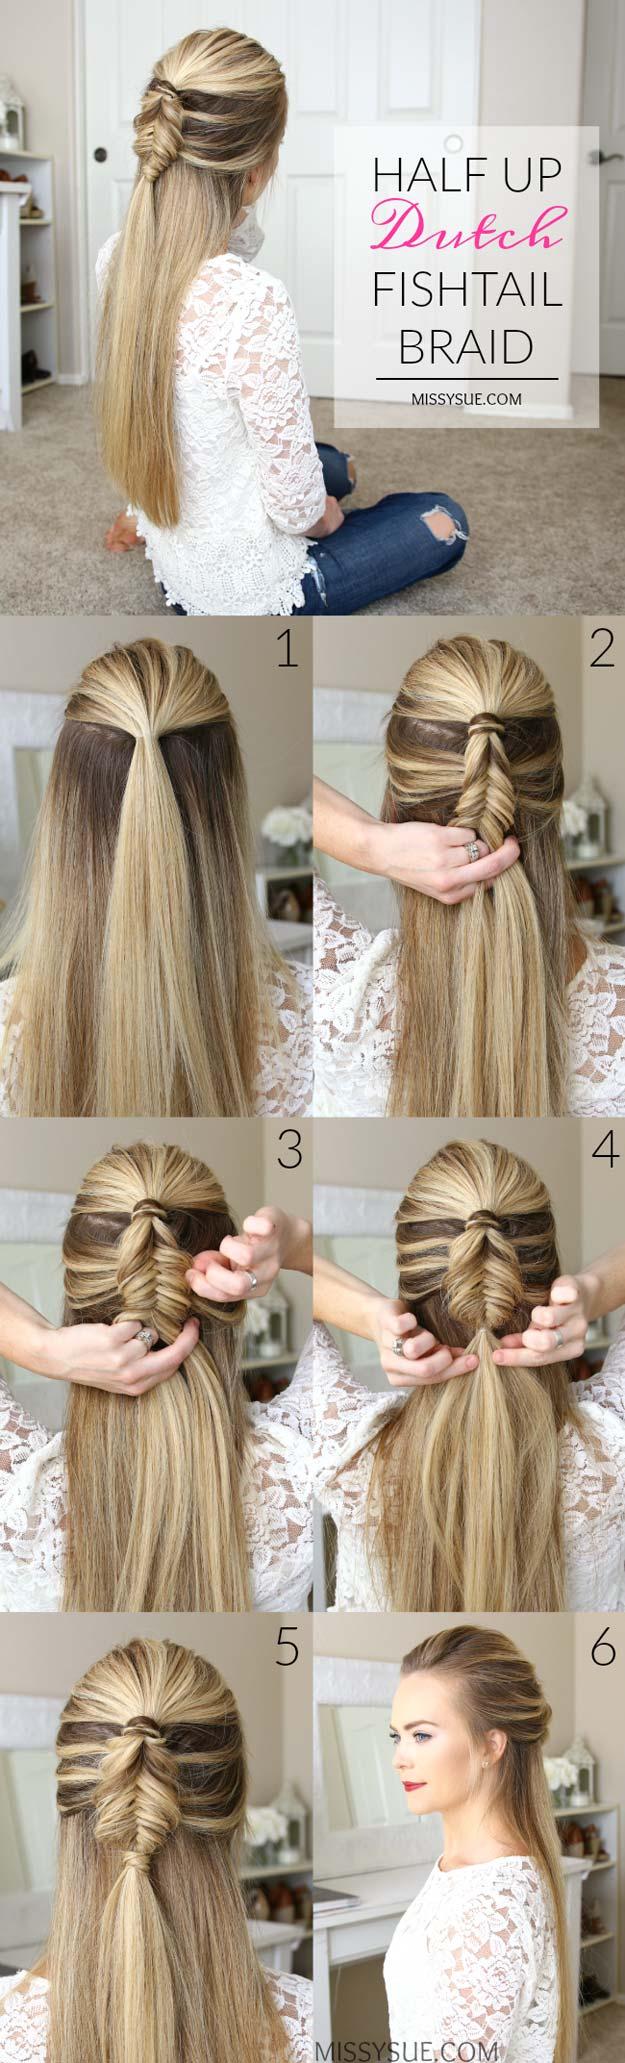 Tremendous 40 Of The Best Cute Hair Braiding Tutorials Diy Projects For Teens Short Hairstyles Gunalazisus